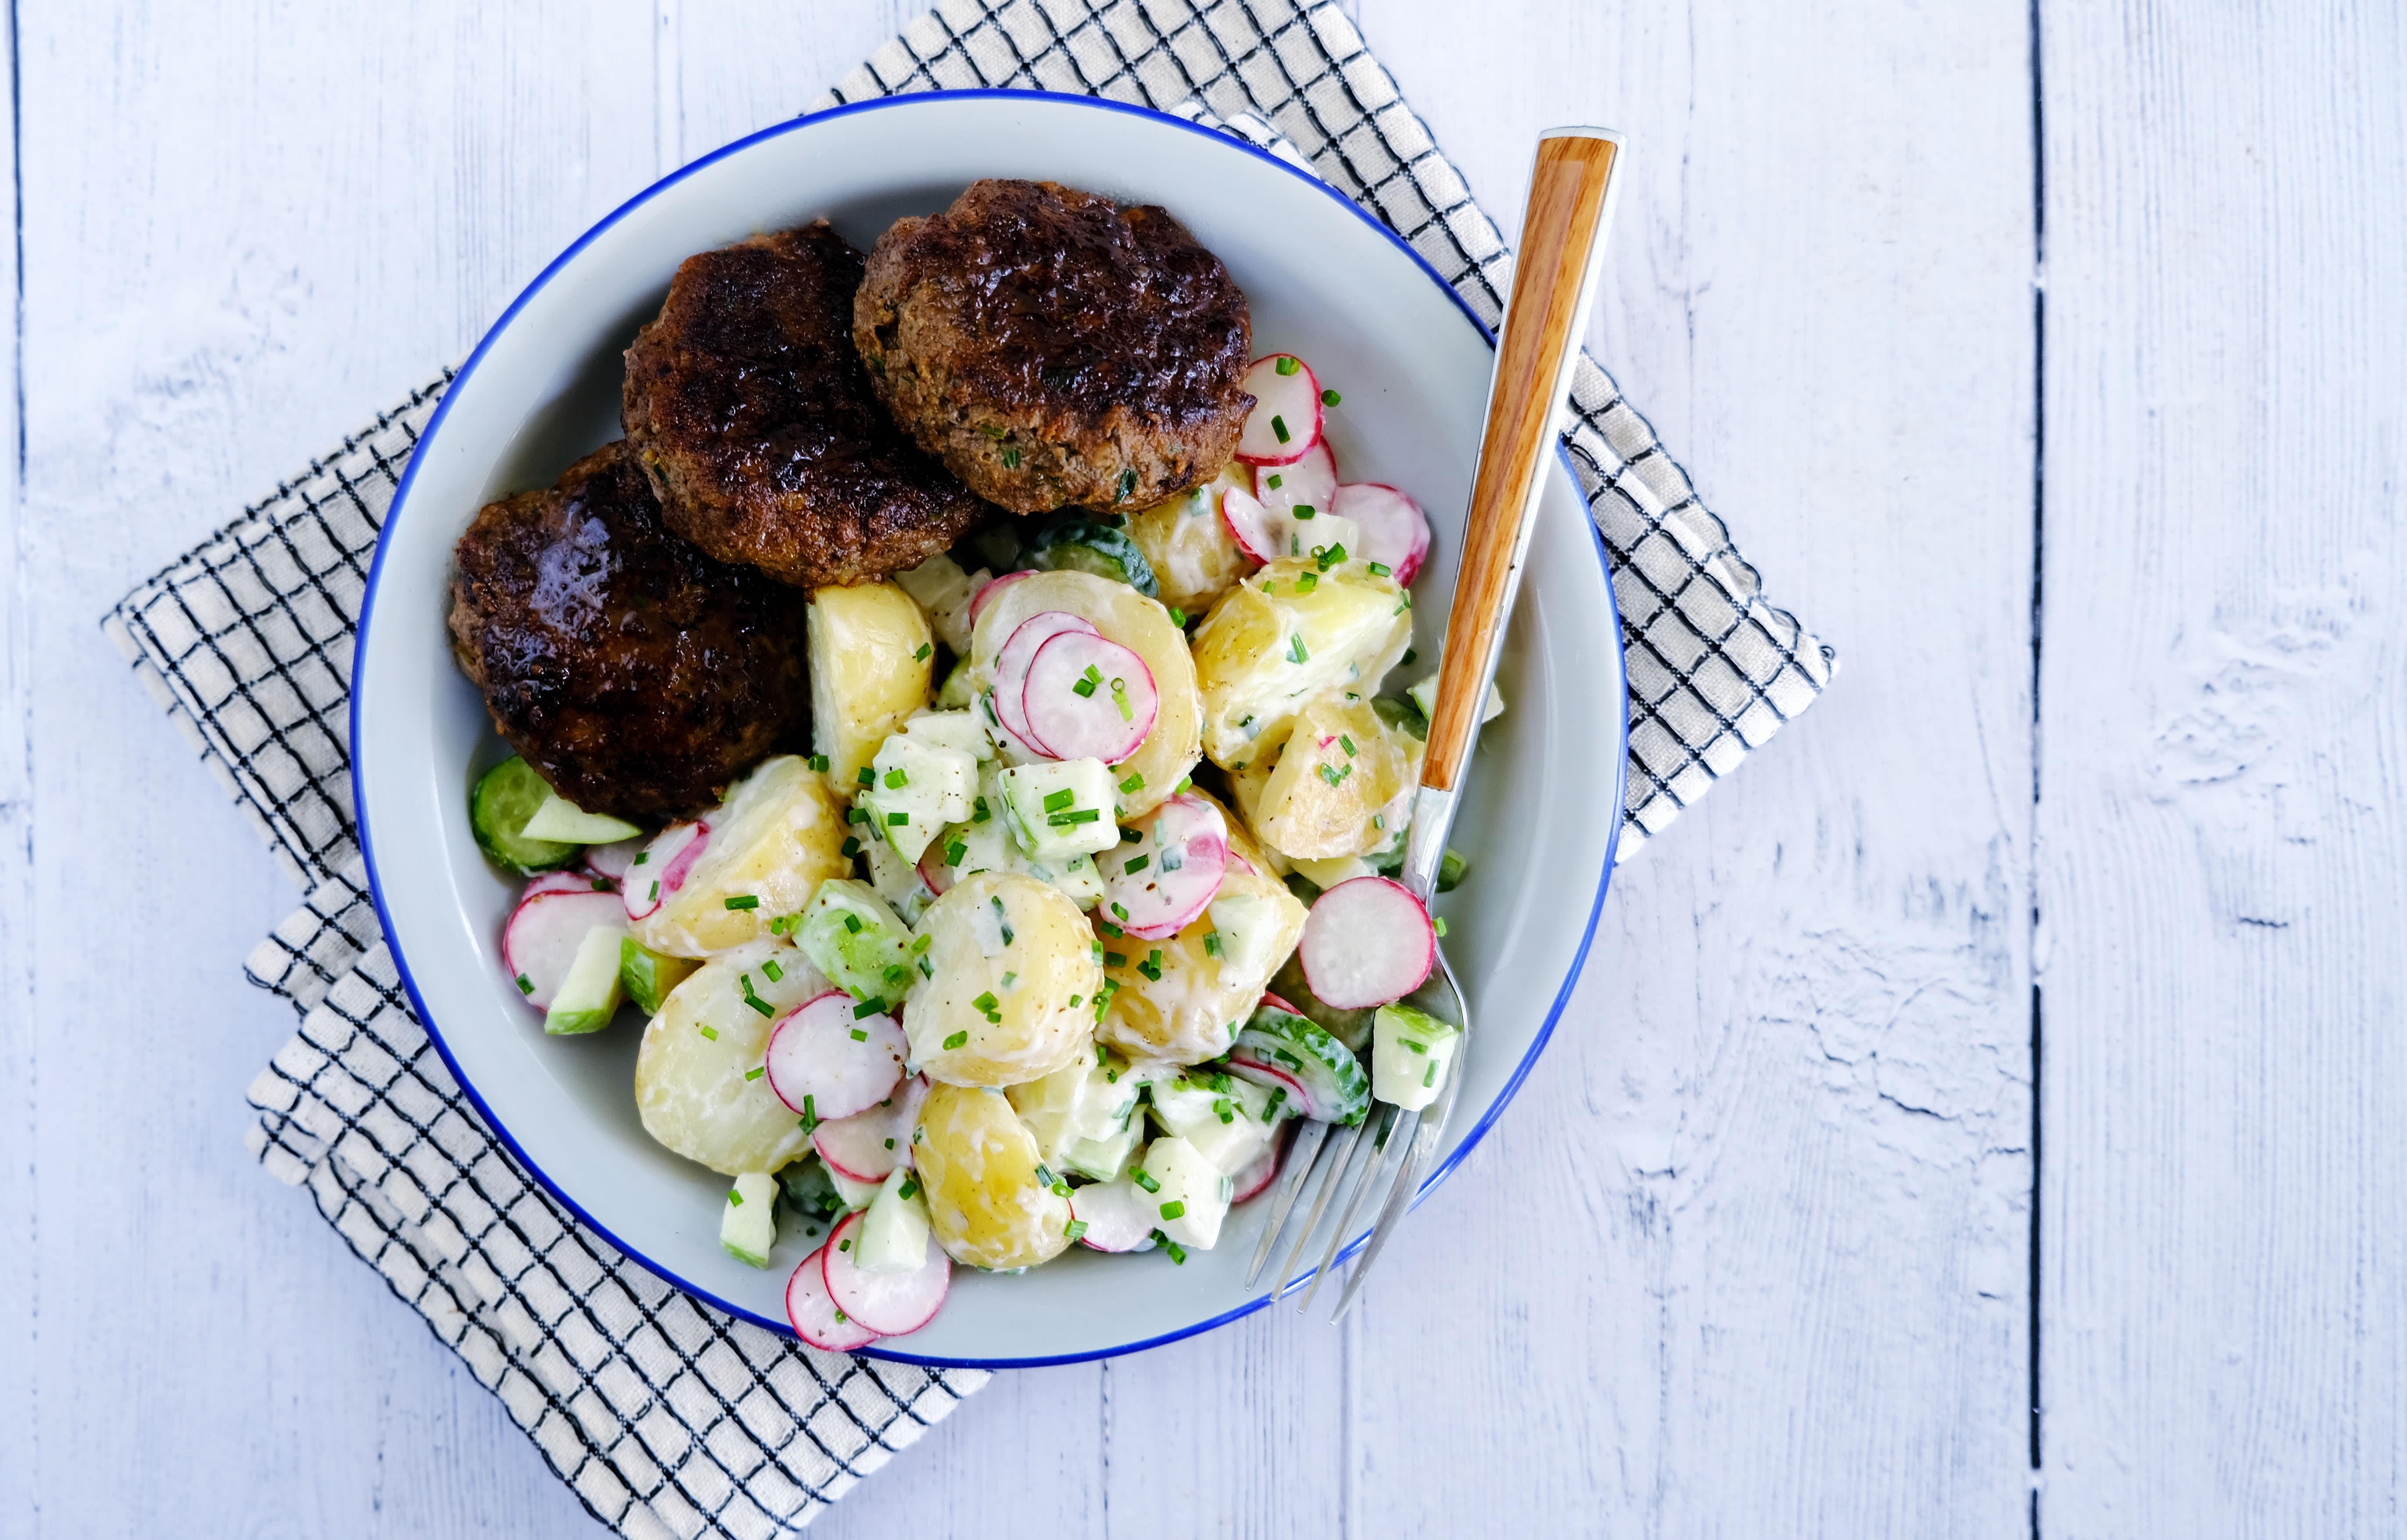 German Beef Meatballs with Creamy Potato Salad